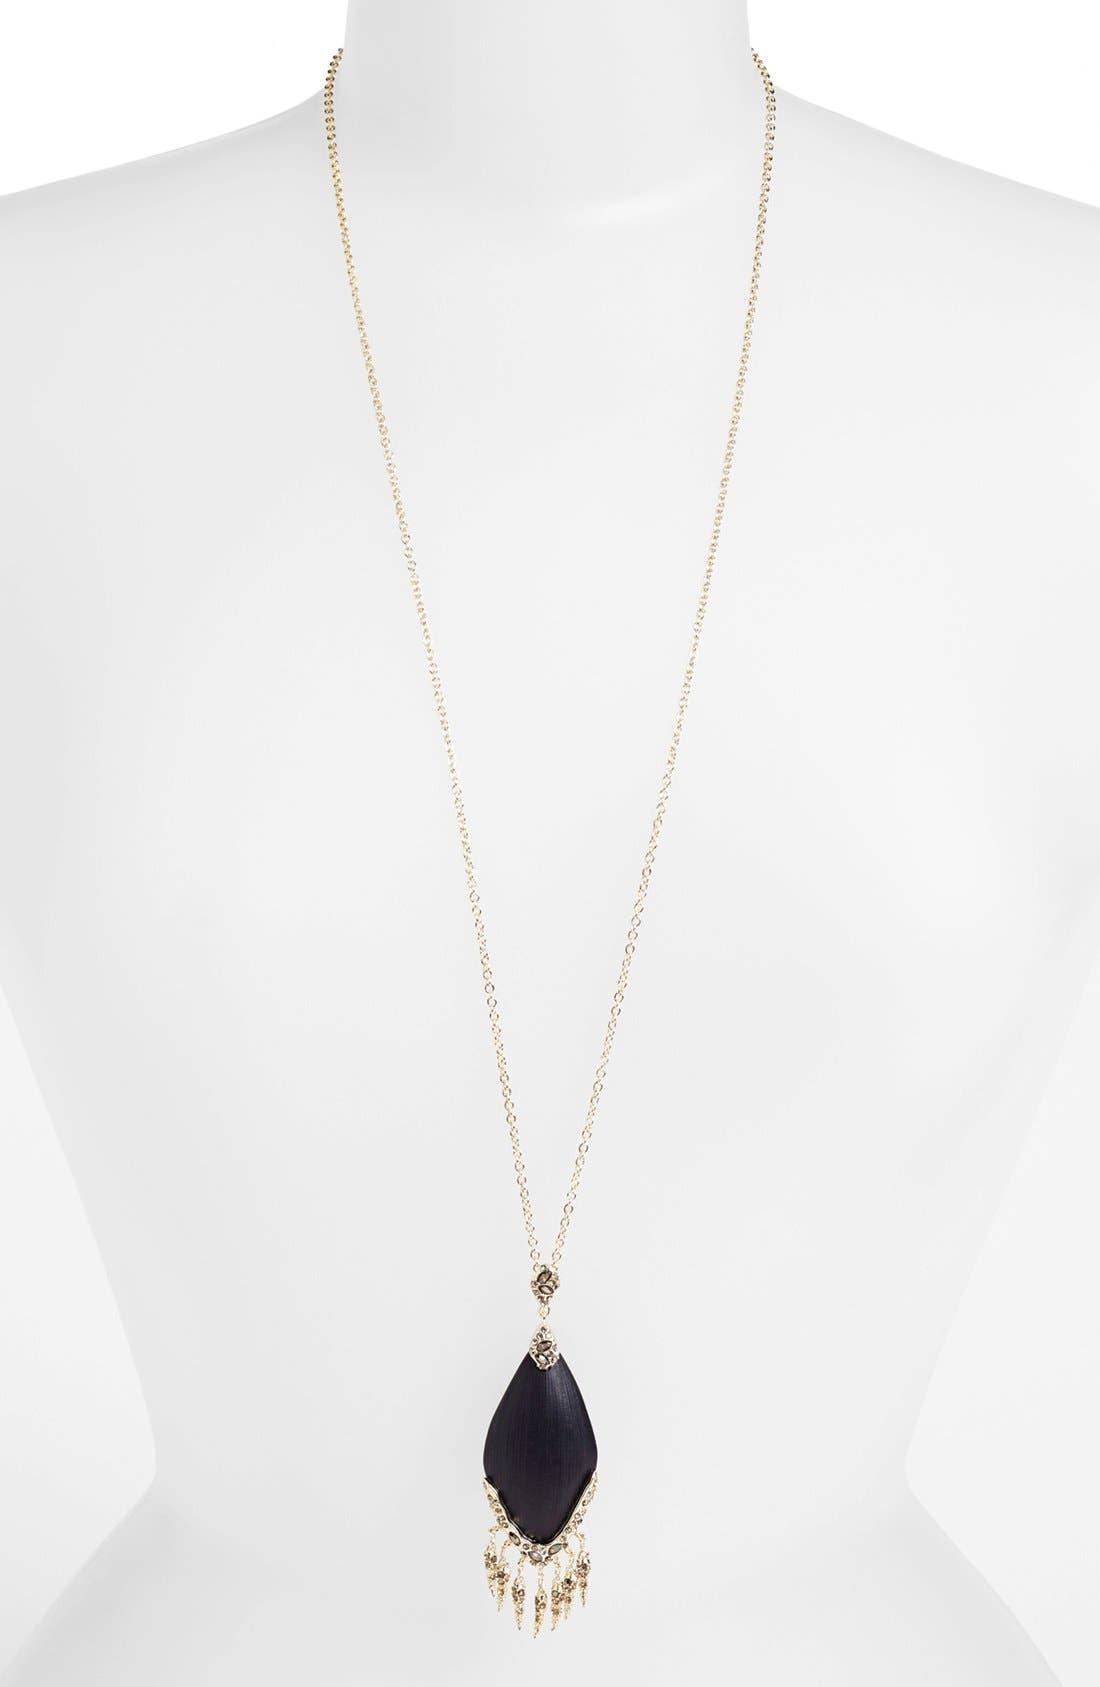 Alternate Image 1 Selected - Alexis Bittar 'Lucite® - Neo Bohemian' Long Fringe Pendant Necklace